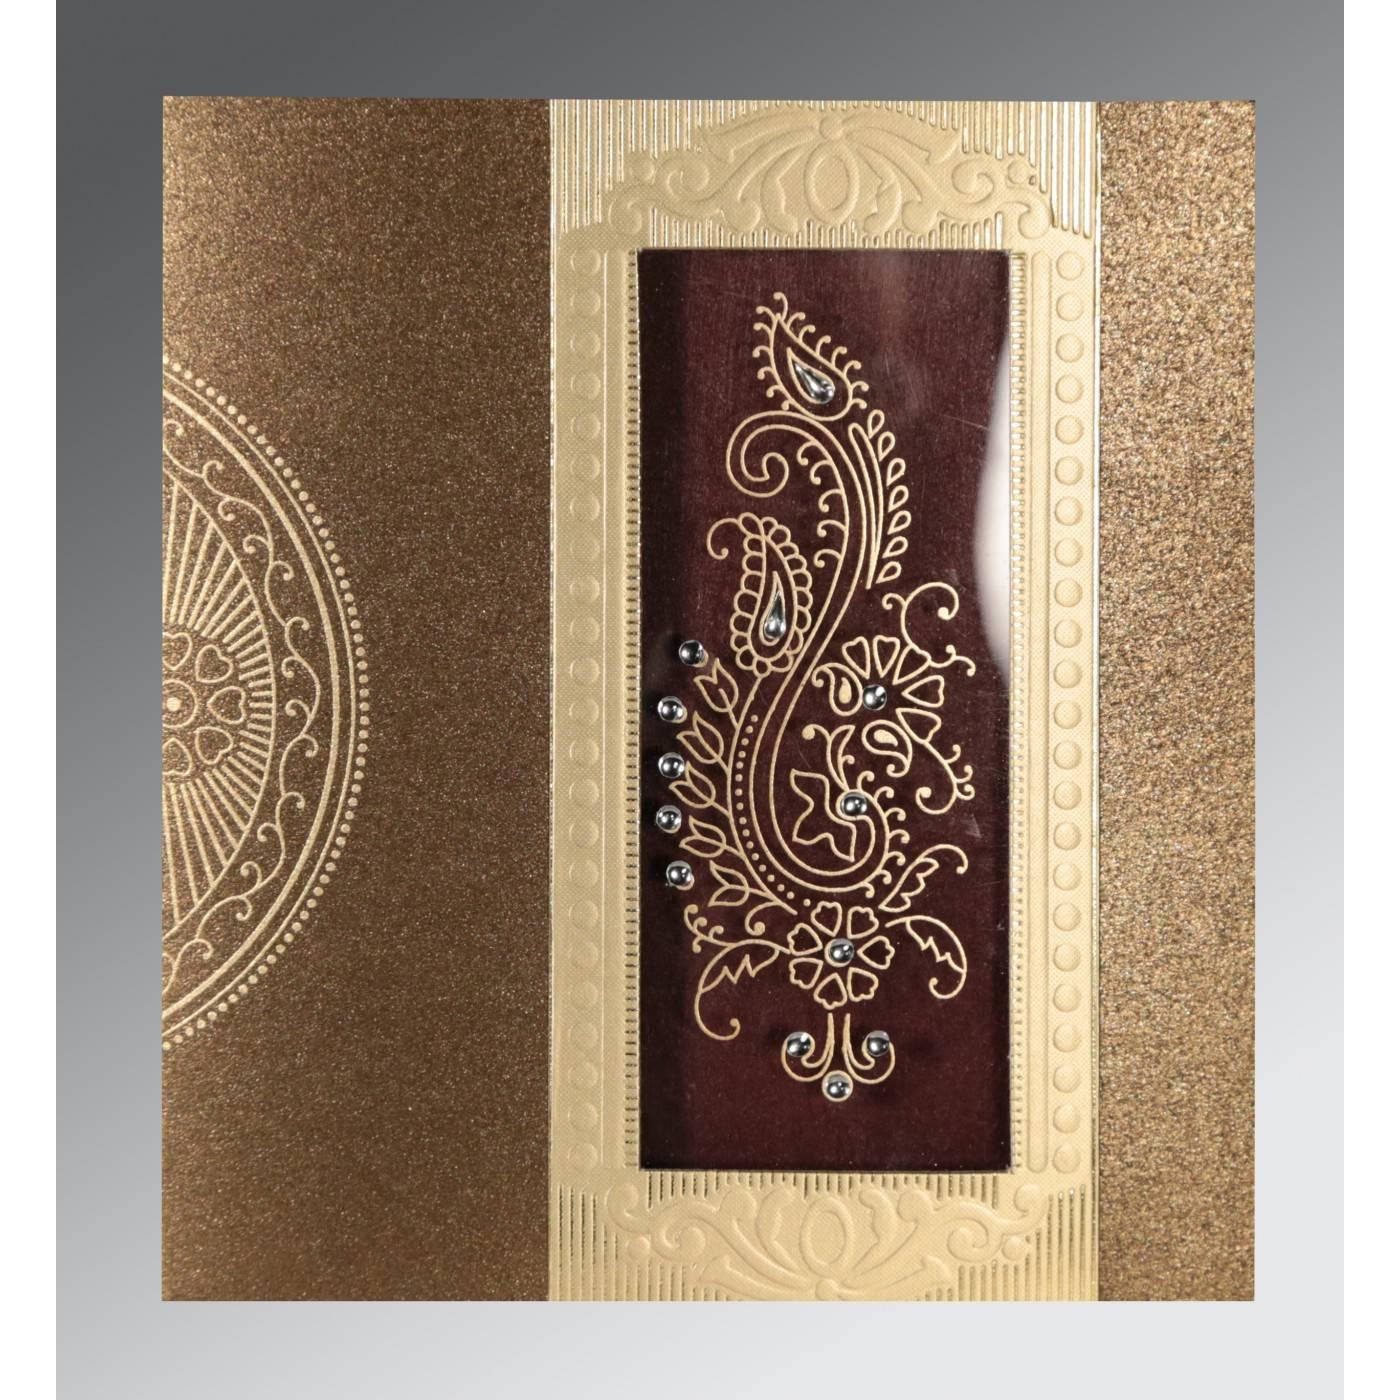 TURFTAN SHIMMERY PAISLEY THEMED - FOIL STAMPED WEDDING INVITATION : CRU-8230M - IndianWeddingCards